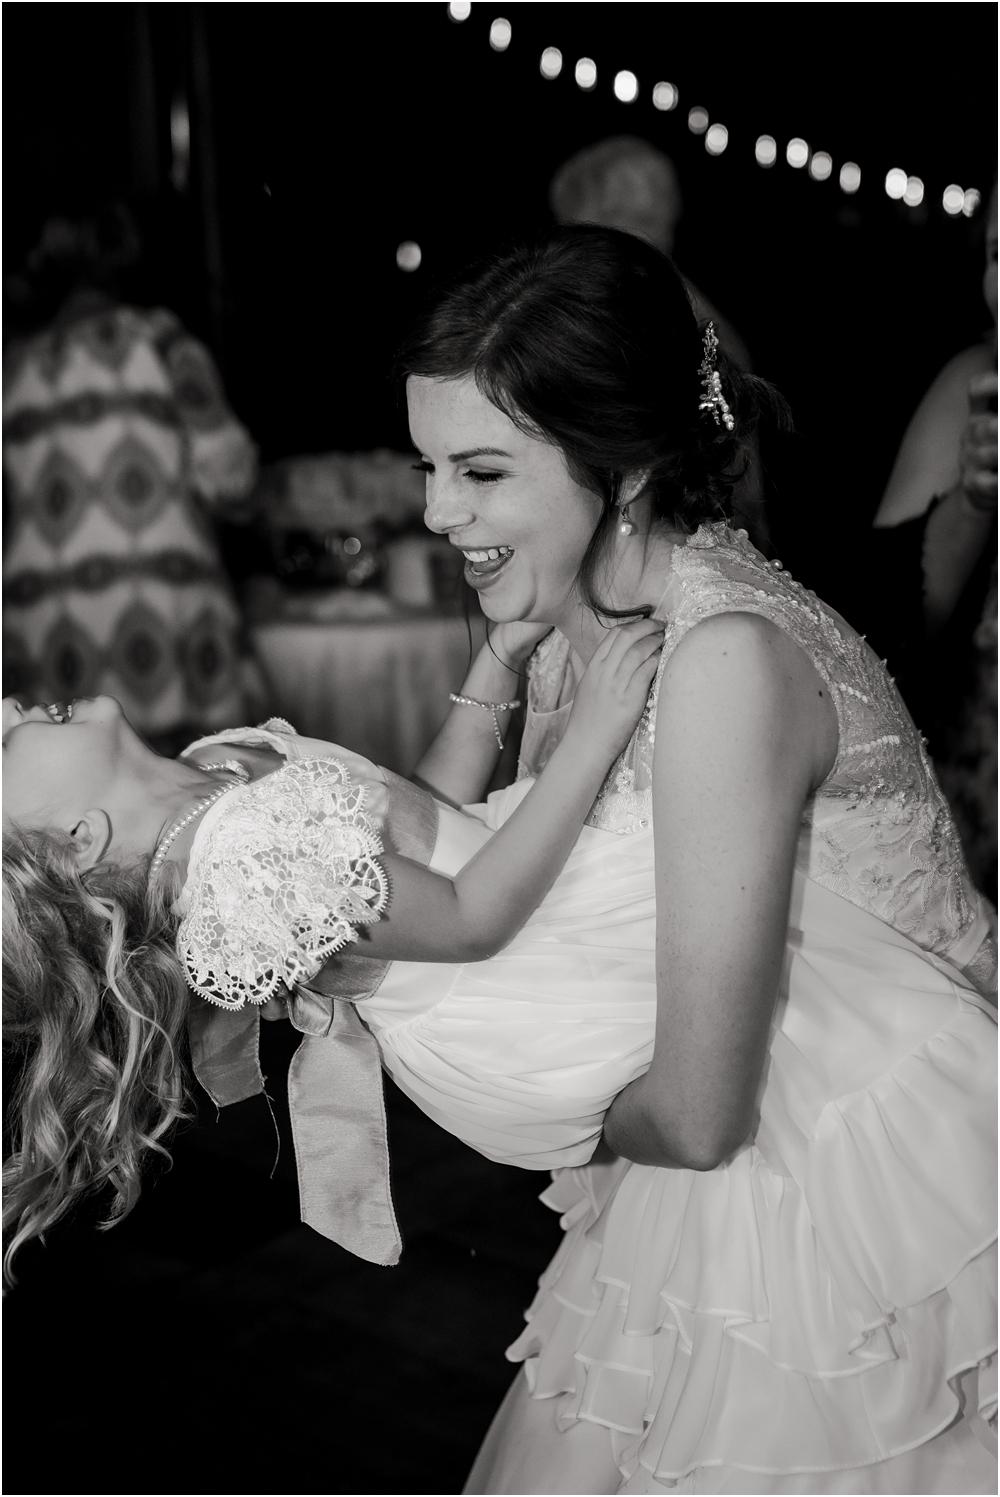 marianna-florida-wedding-photographer-kiersten-grant-208.jpg